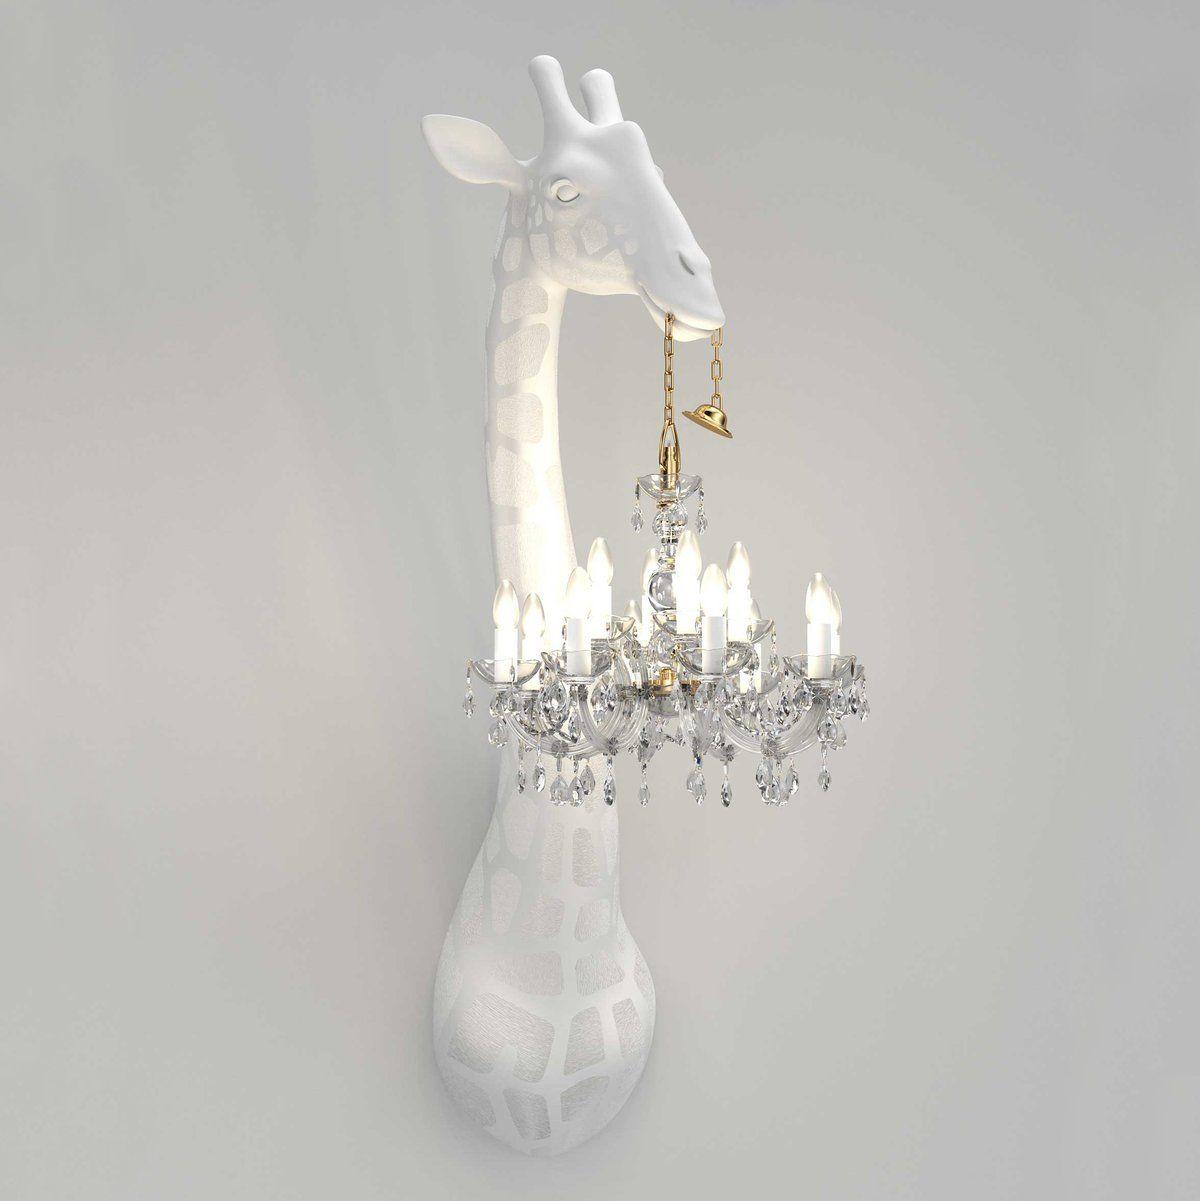 Giraffe In Love Wall Lamp I 2020 Inspirasjon Hus